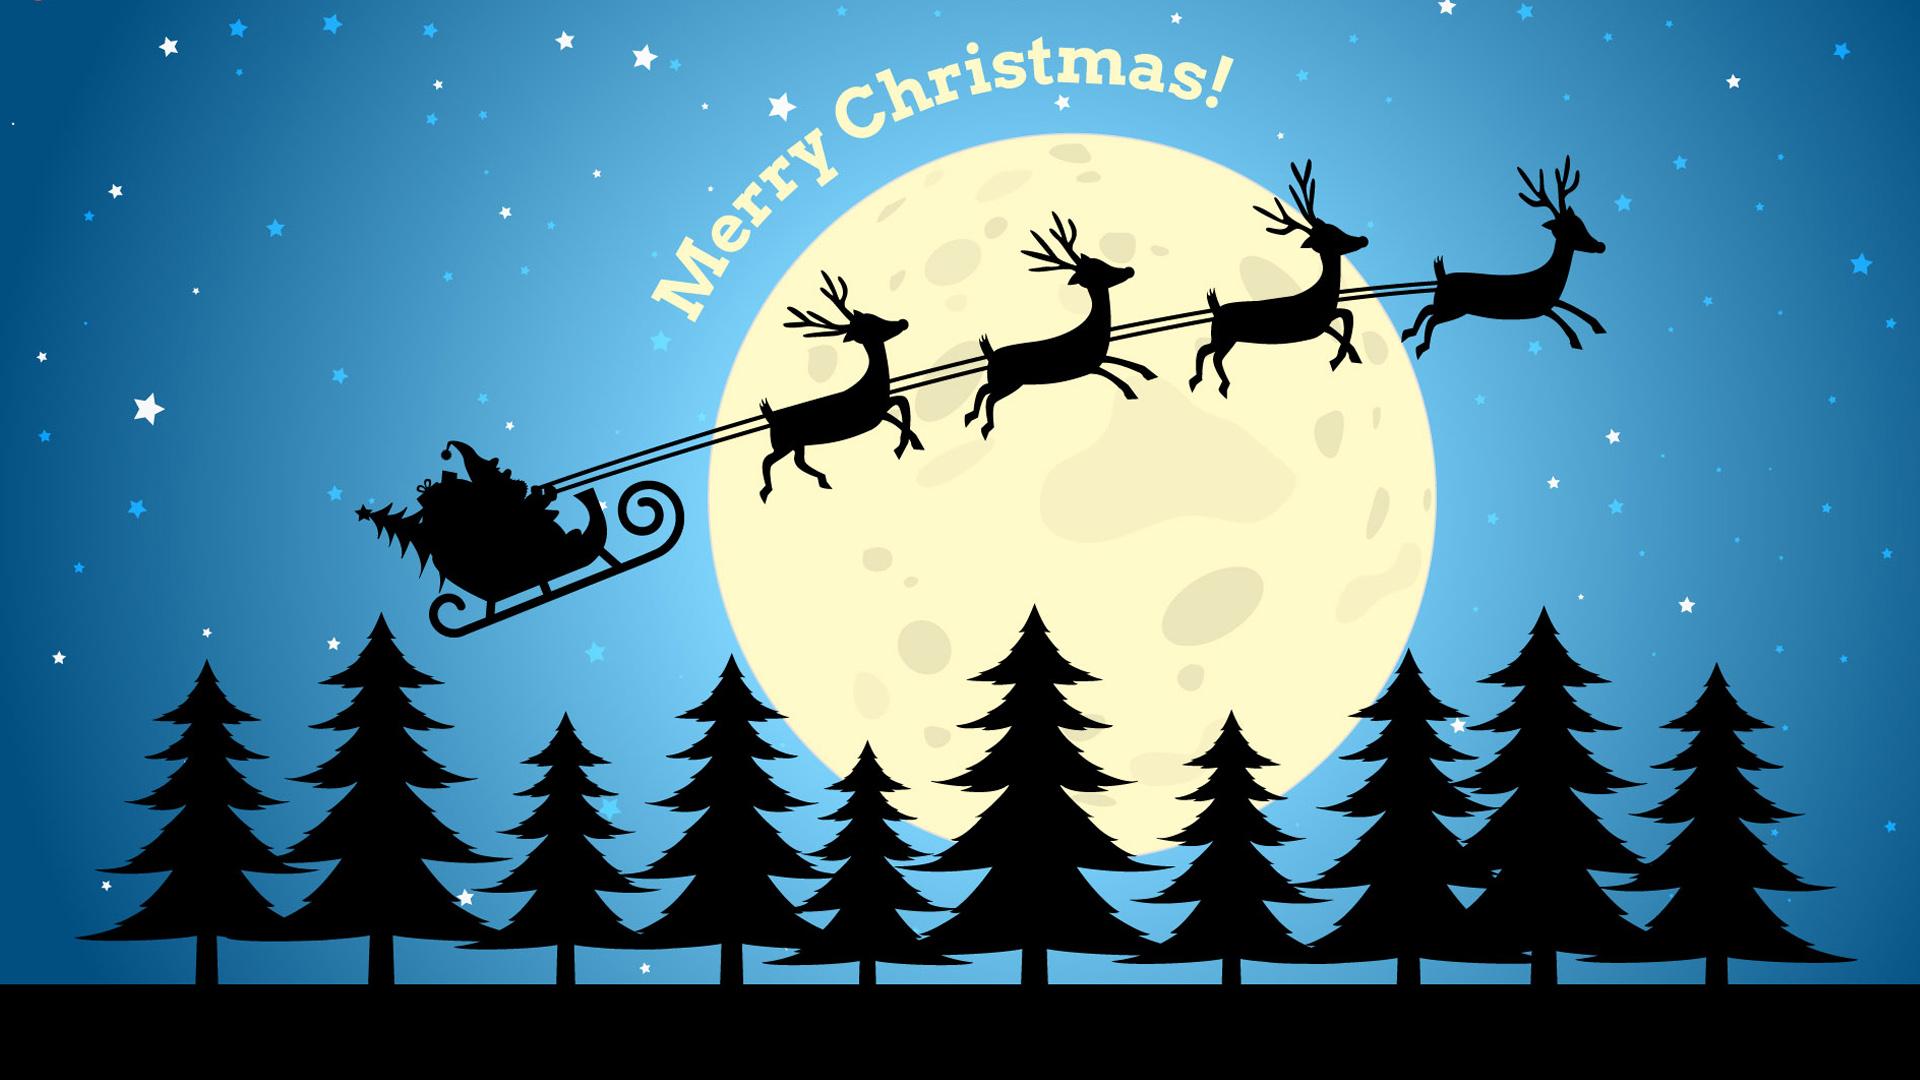 Merry Christmas Reindeer Cart And Full Moon Wallpaper Hd